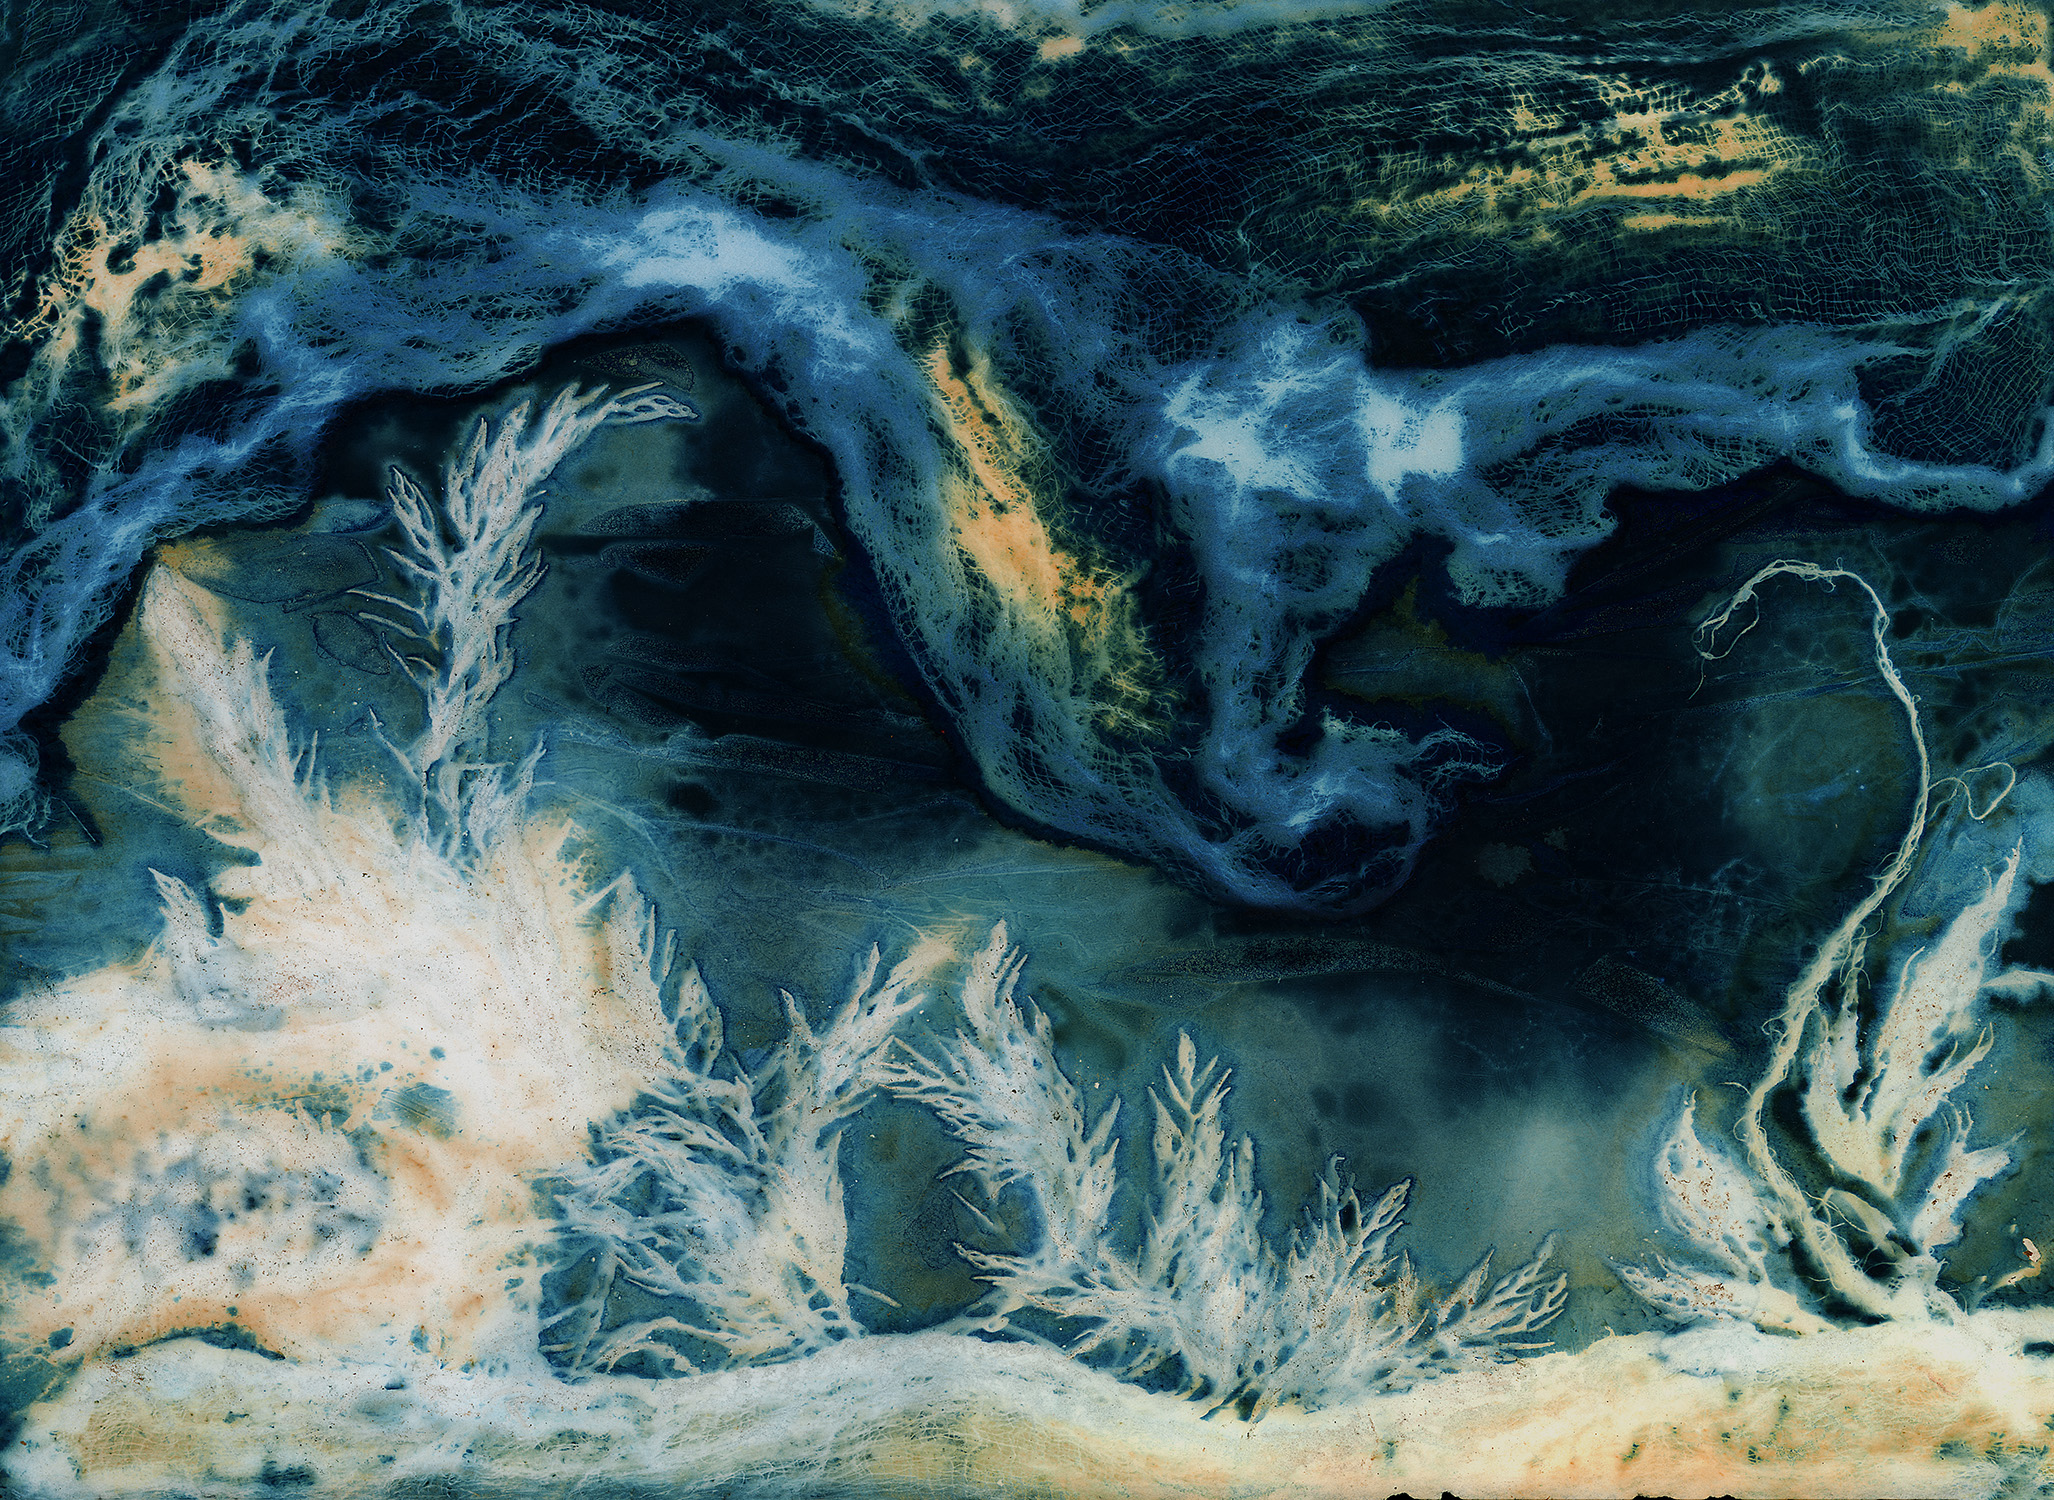 """Under the Sea"" by Heidi Knudsen"